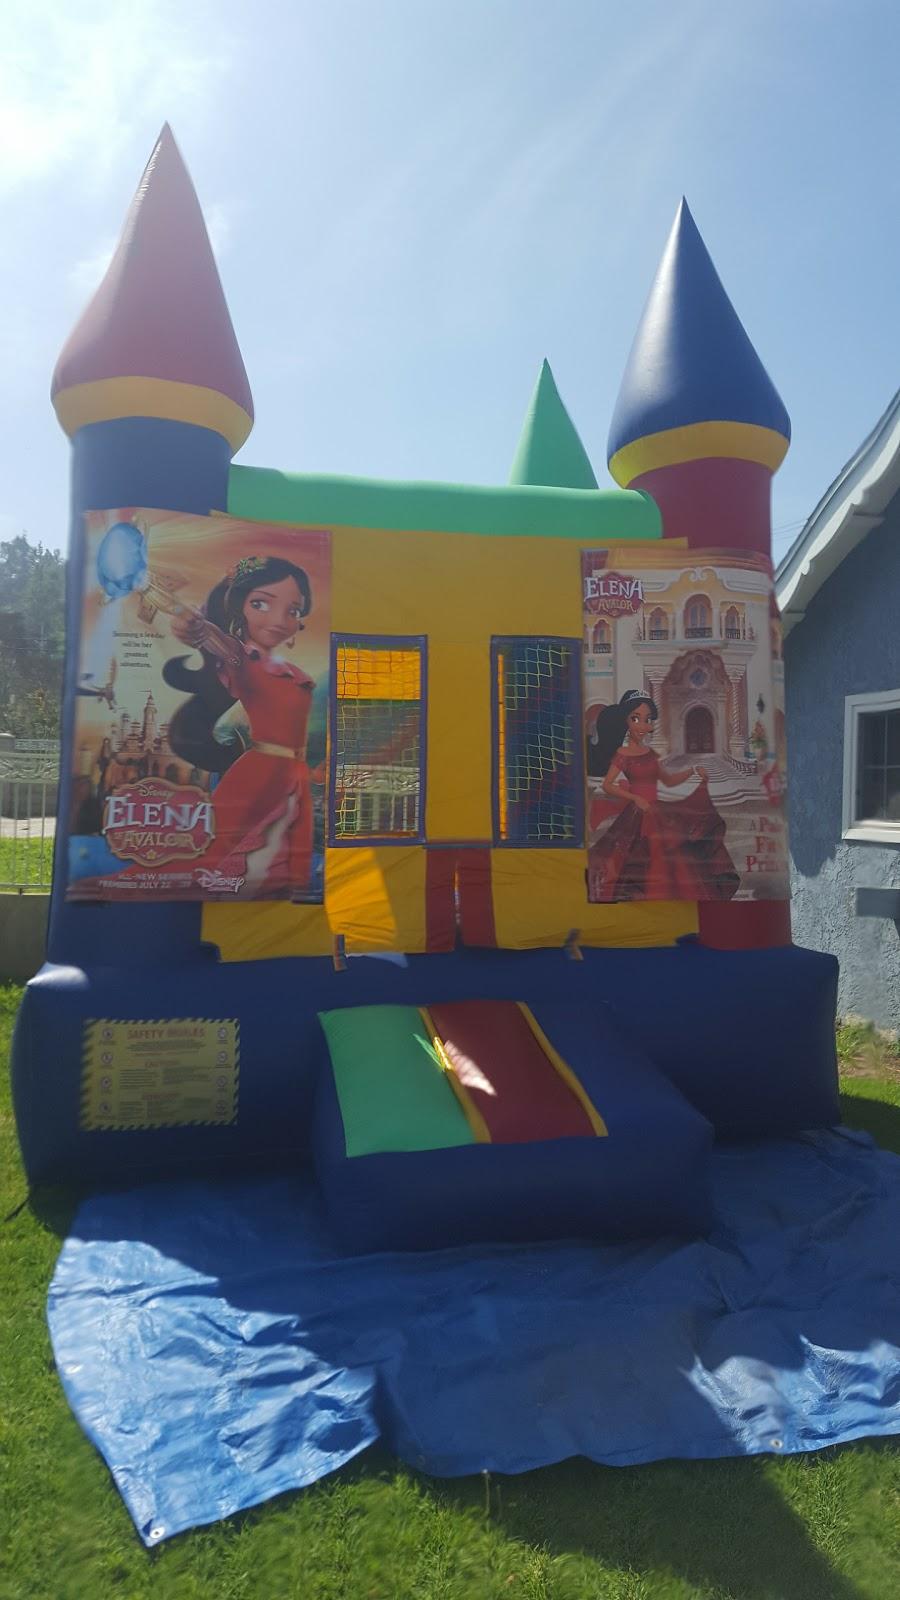 Las Tres Princesas - home goods store  | Photo 5 of 10 | Address: 1312 W Francisquito Ave, West Covina, CA 91790, USA | Phone: (626) 918-1116